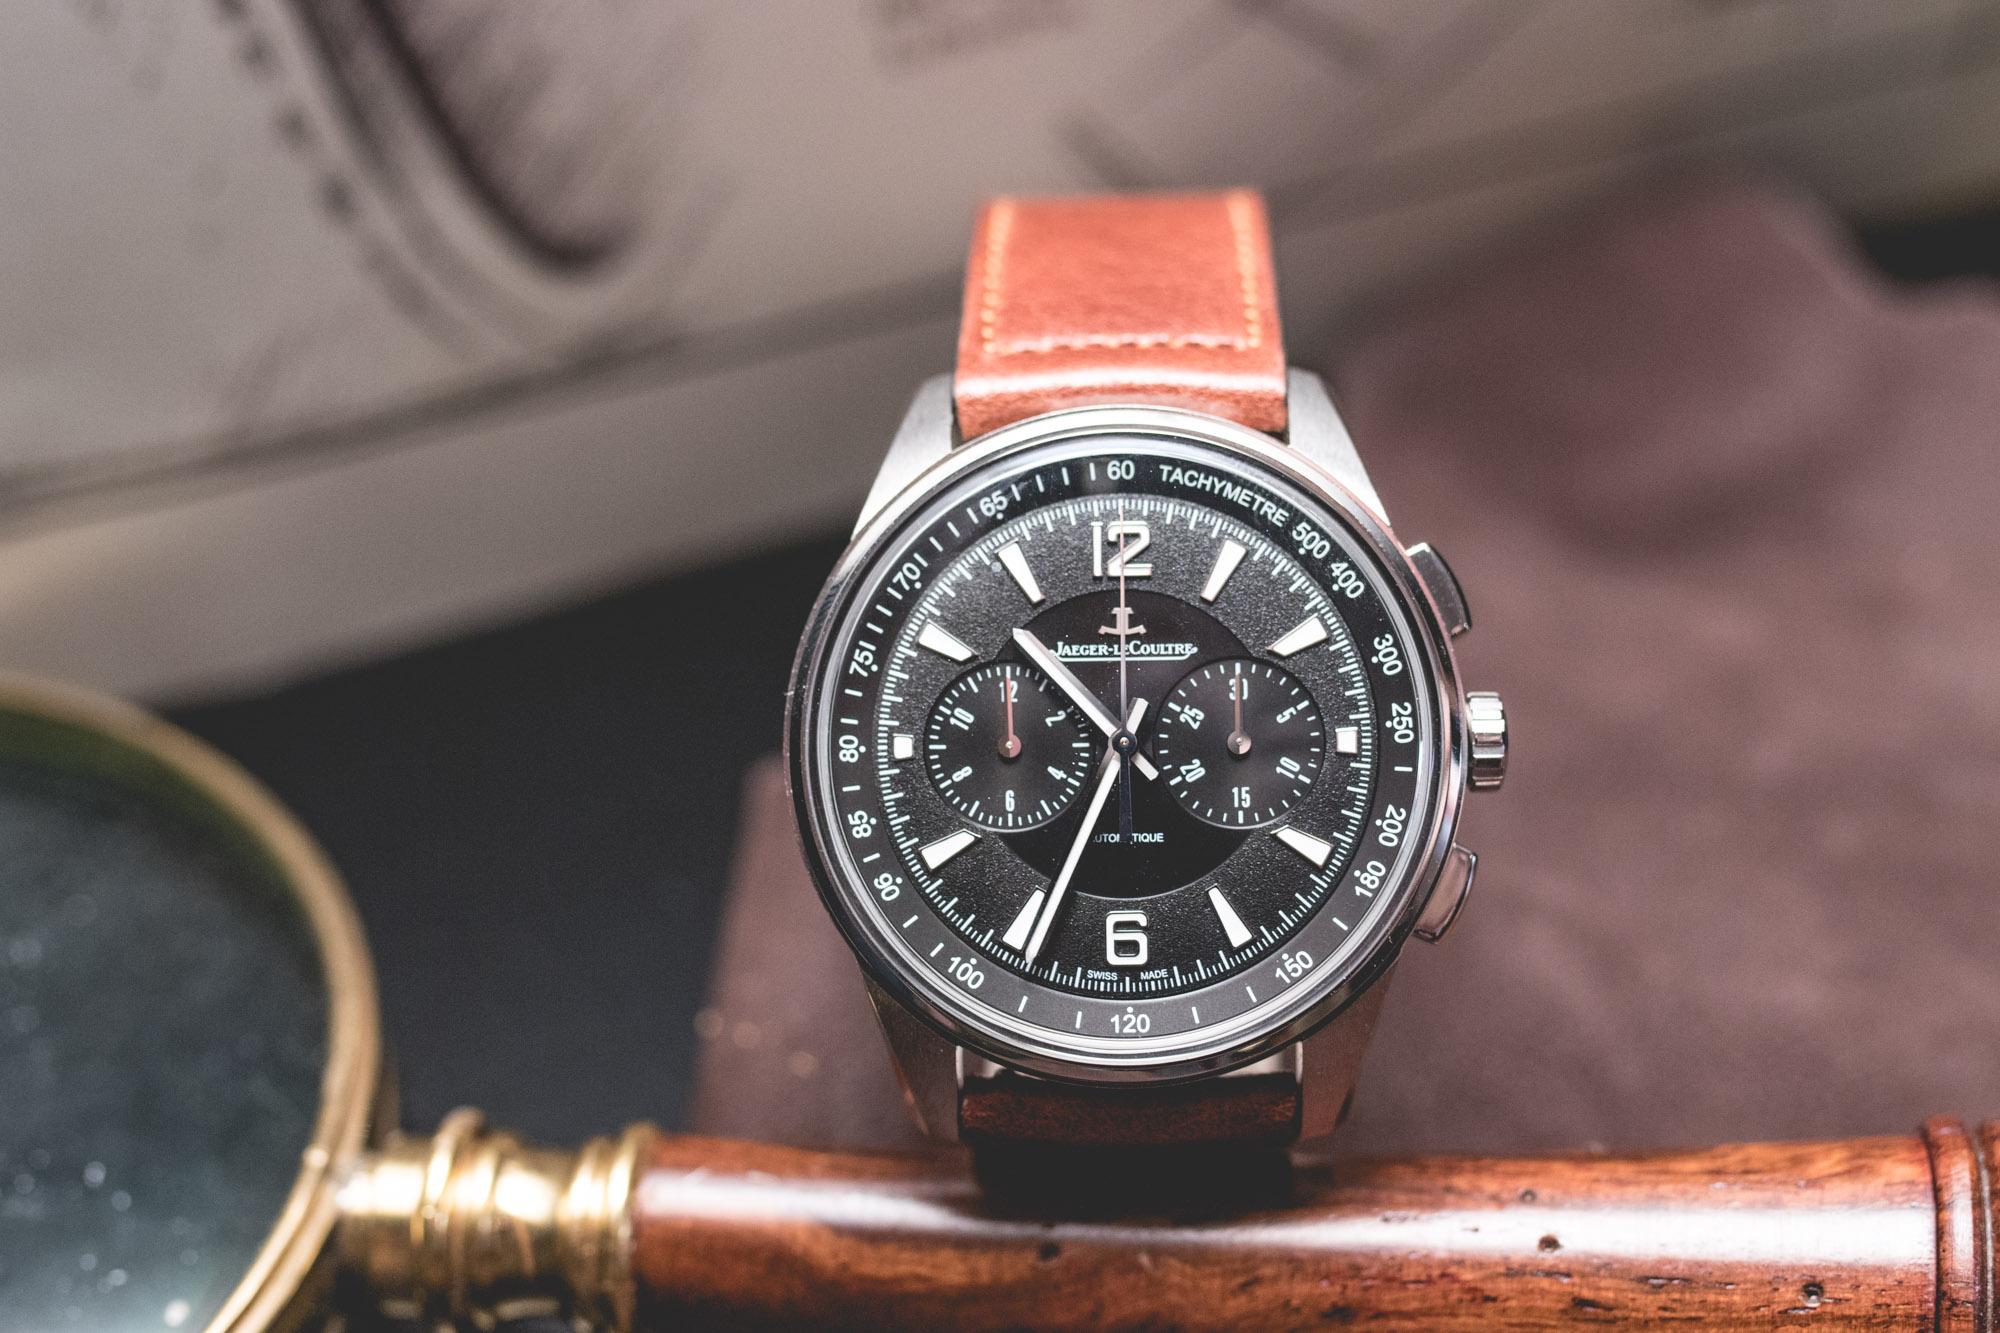 Jaeger Lecoultre - SIHH 2018 - chronographe automatique -cadran